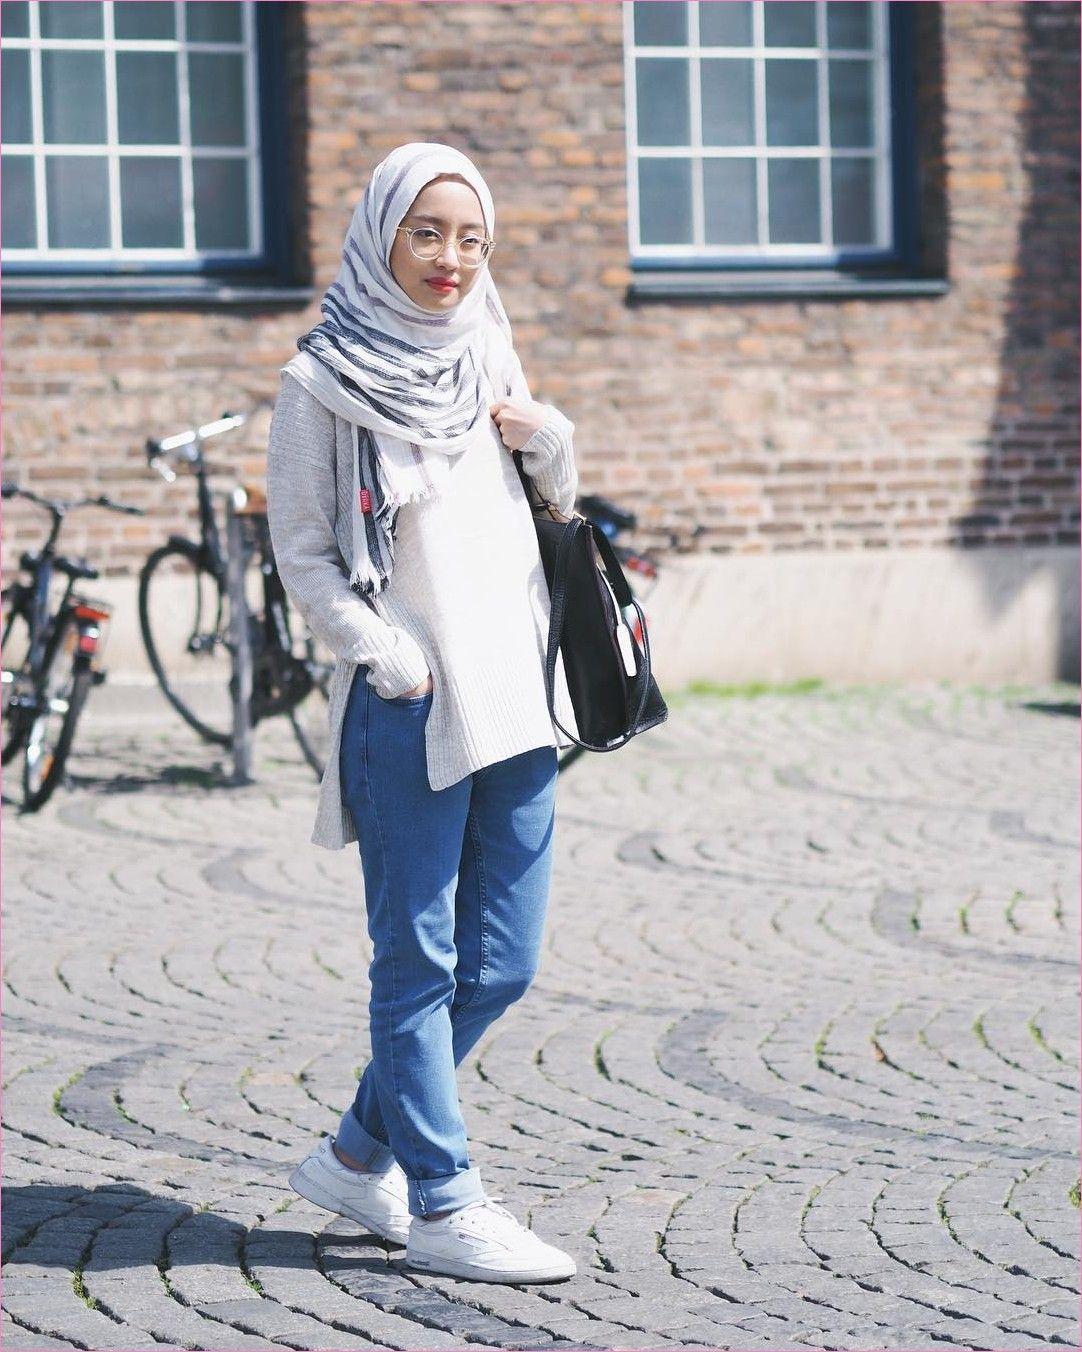 Outfit Baju Remaja Berhijab Ala Selebgram 2018 Sweater Rajut Cream